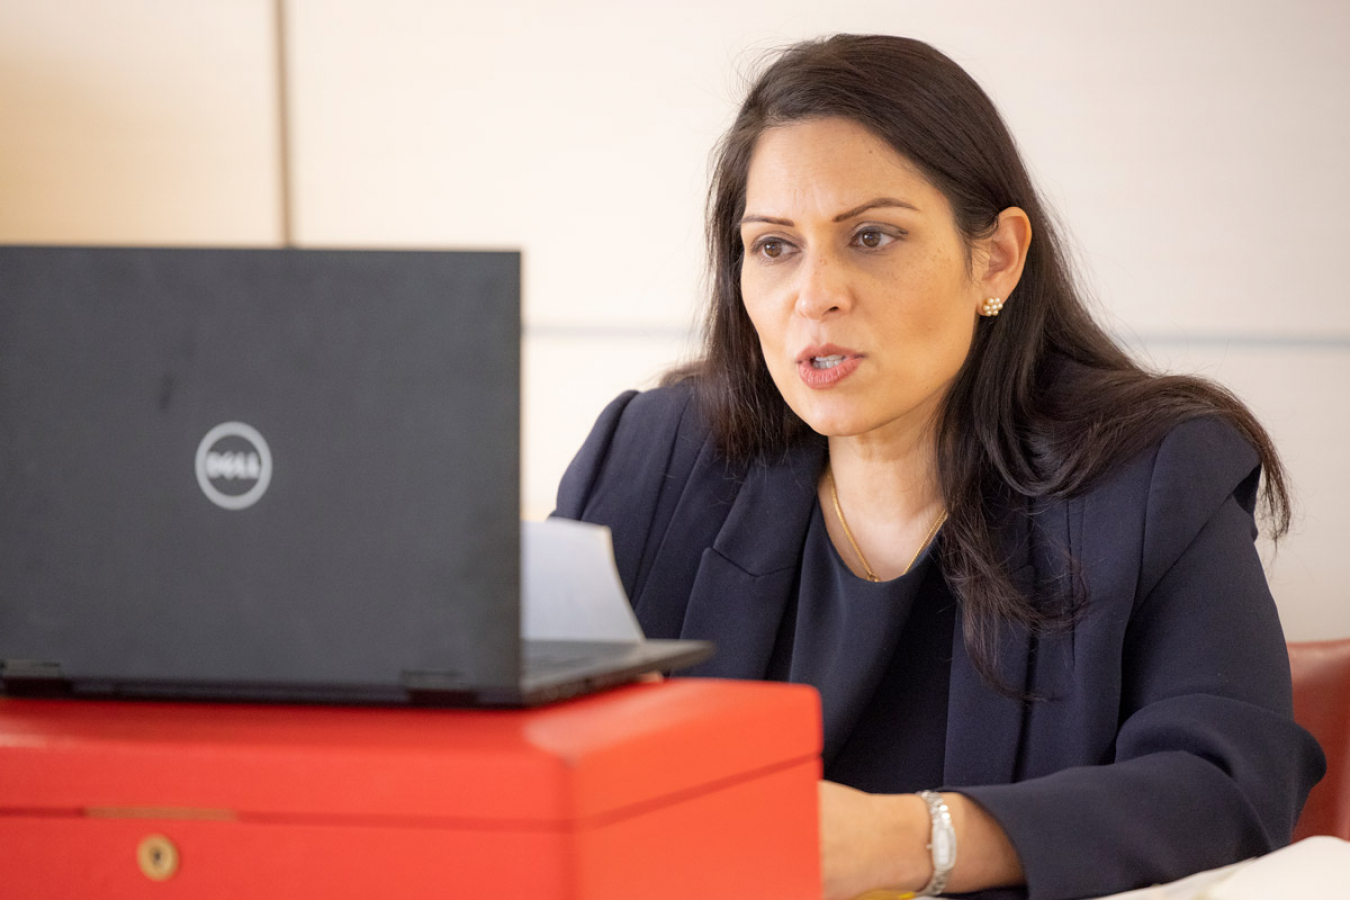 Home Secretary, Priti Patel